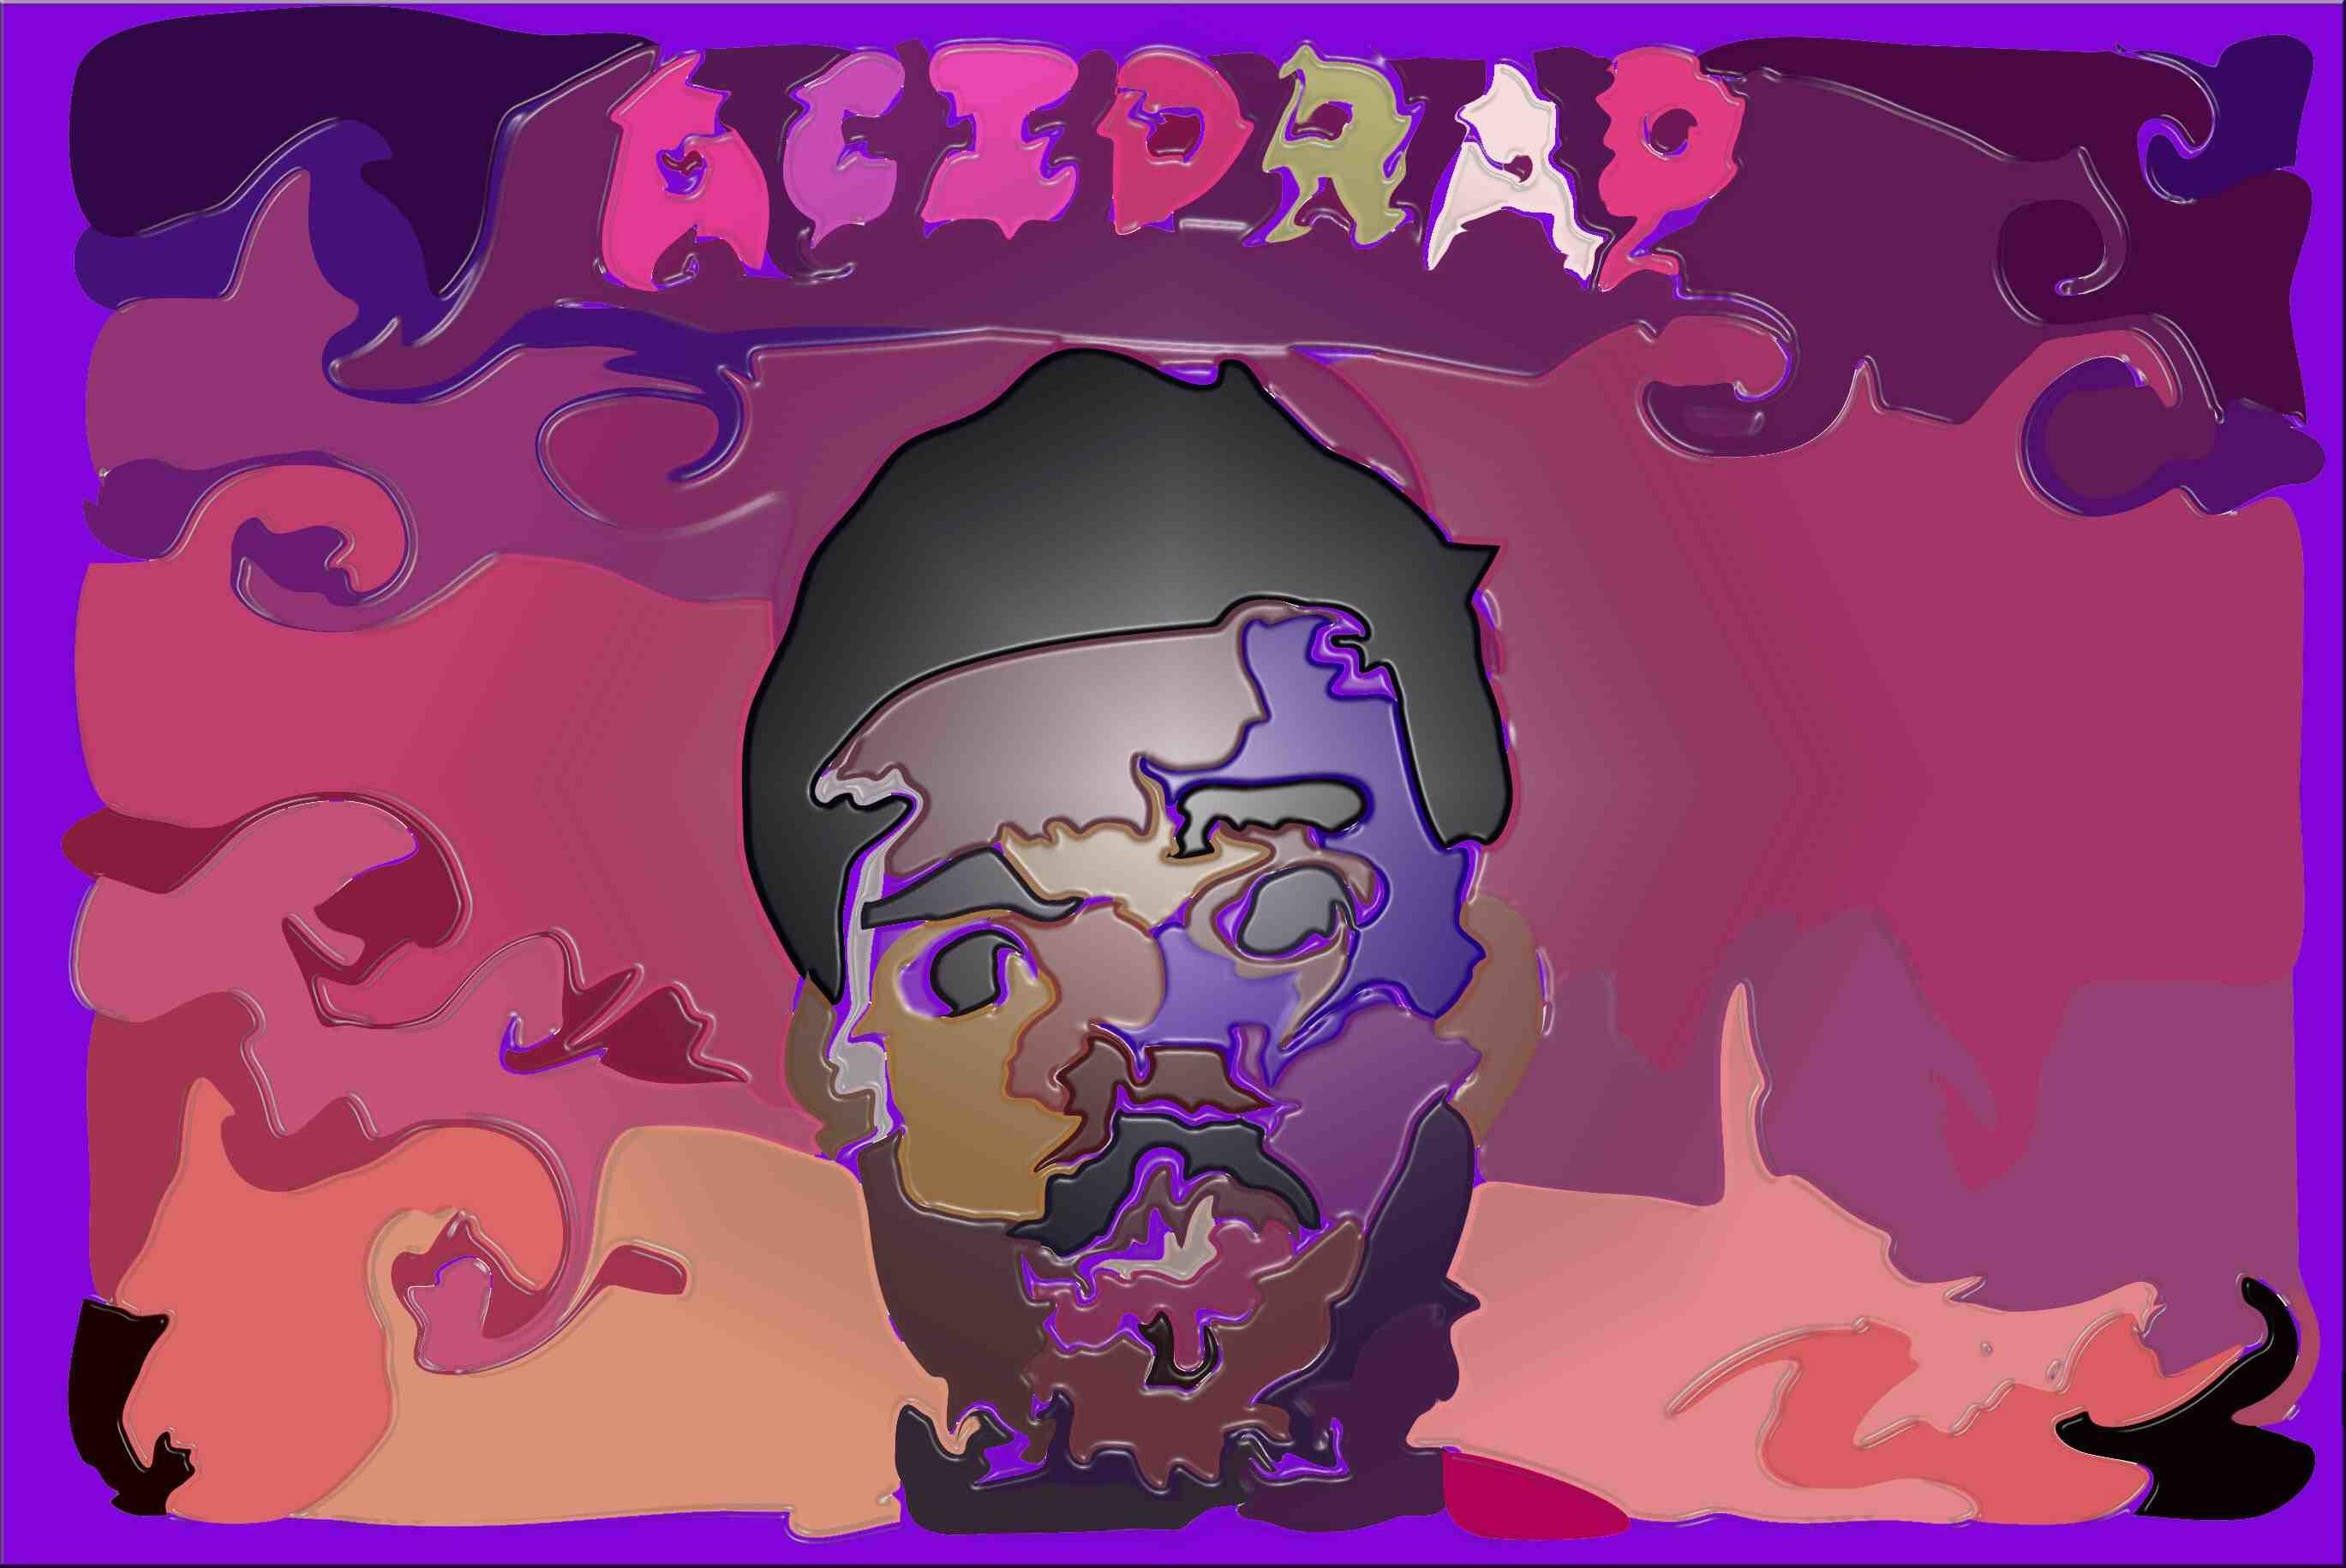 1920x1200 HD Acid Trip Park Wallpaper